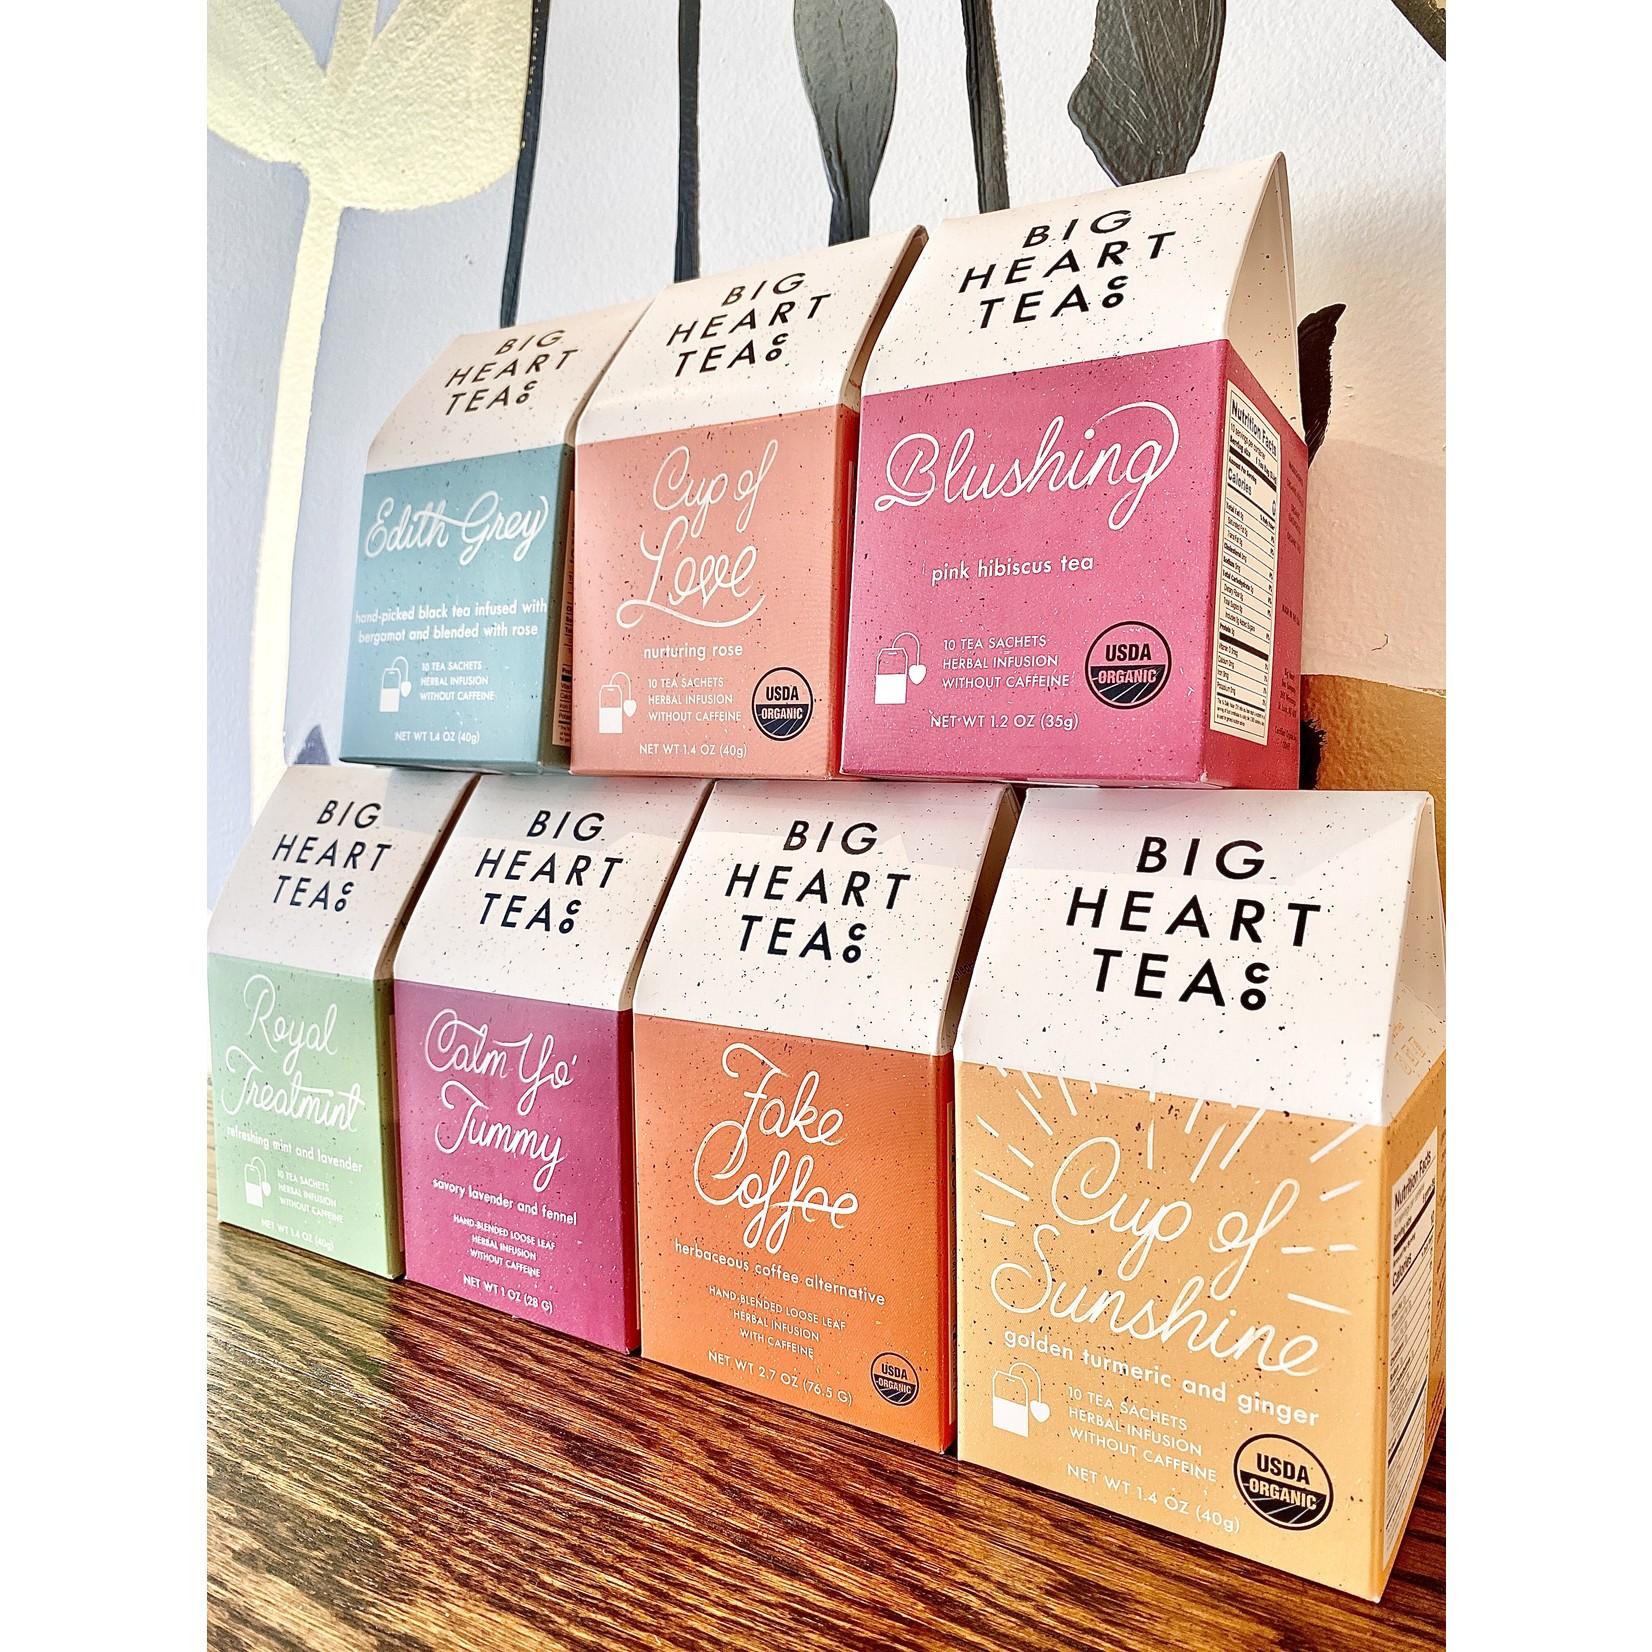 Big Heart Tea Co. Herbal Tea Bag Boxes